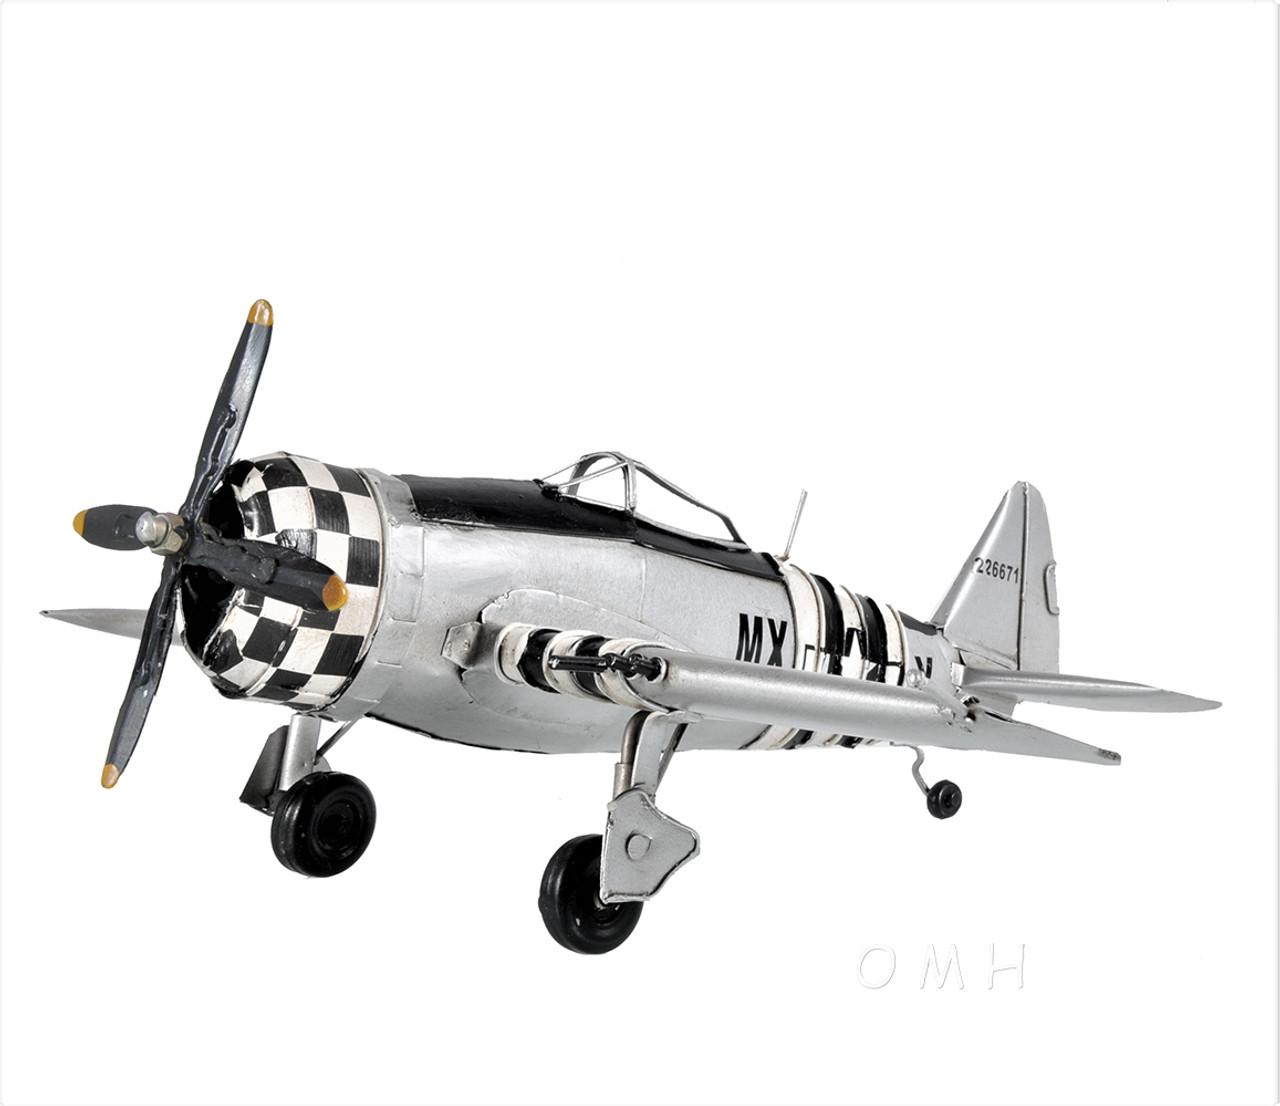 P-47 Jug Thunderbolt Fighter Bomber Model WWII Airplane